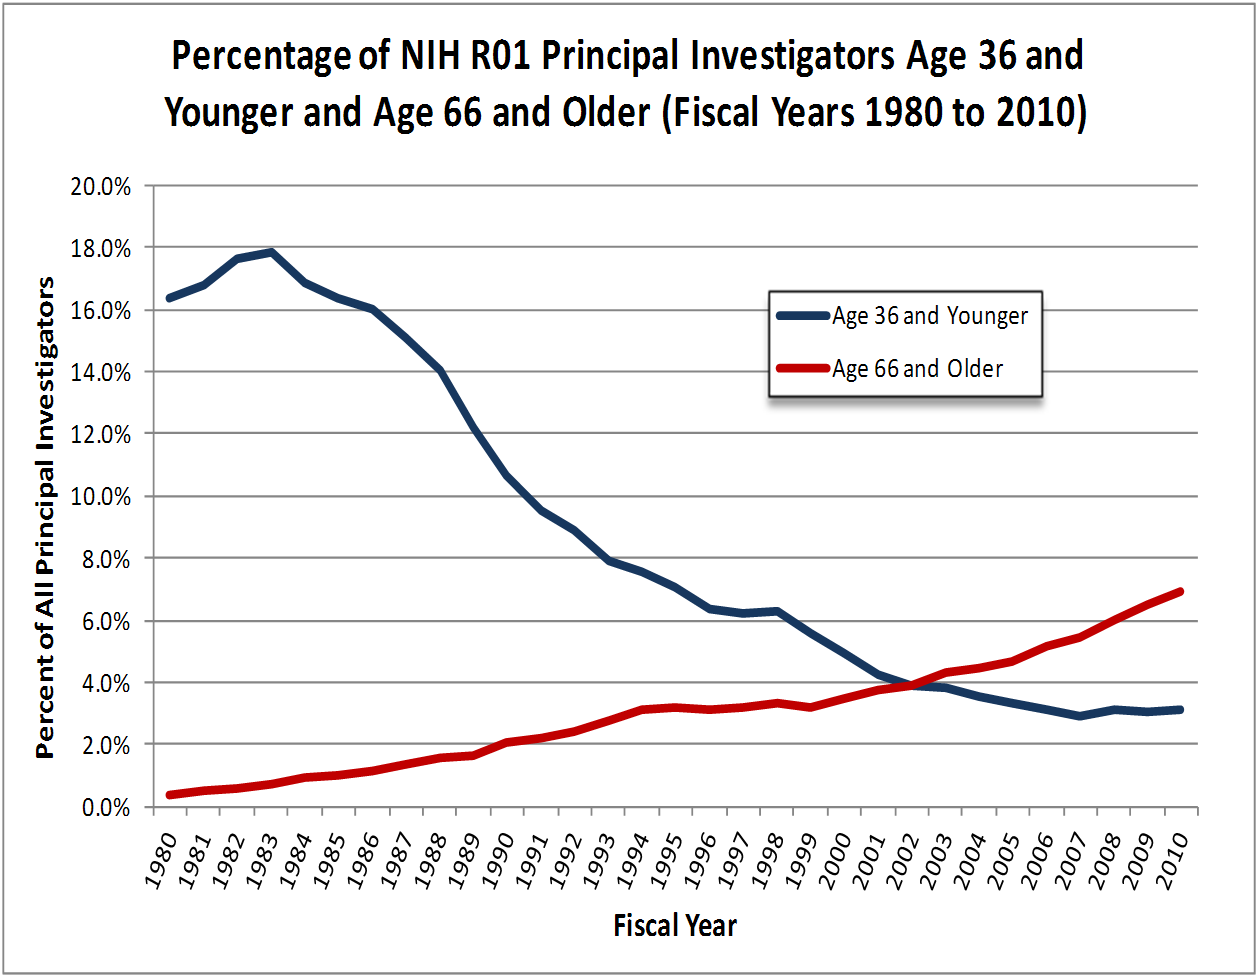 Age Distribution of NIH Principal Investigators and Medical